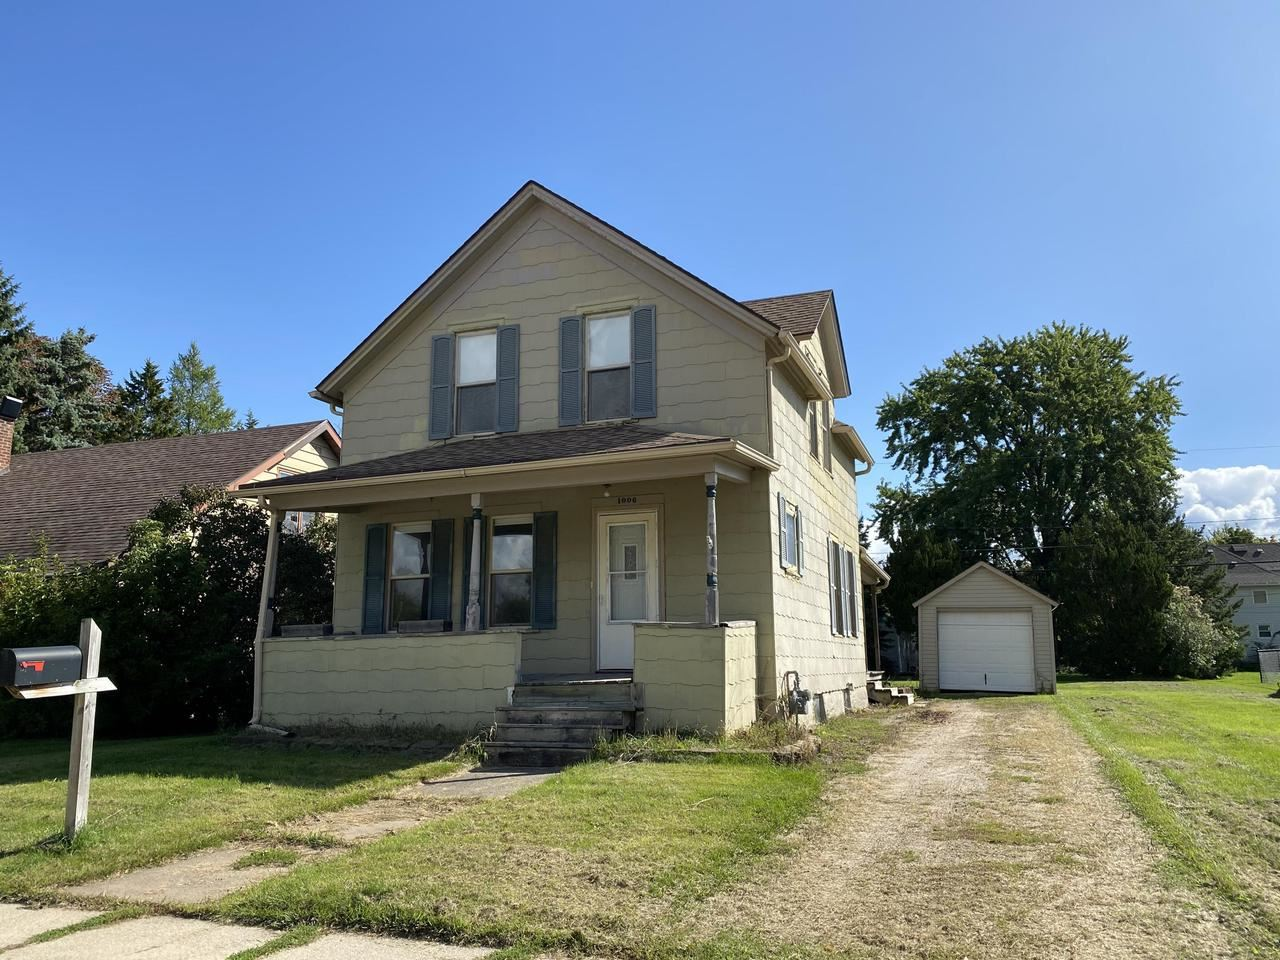 1006 Minnesota Ave, Fond du Lac, WI 54937 - MLS#: 1711169